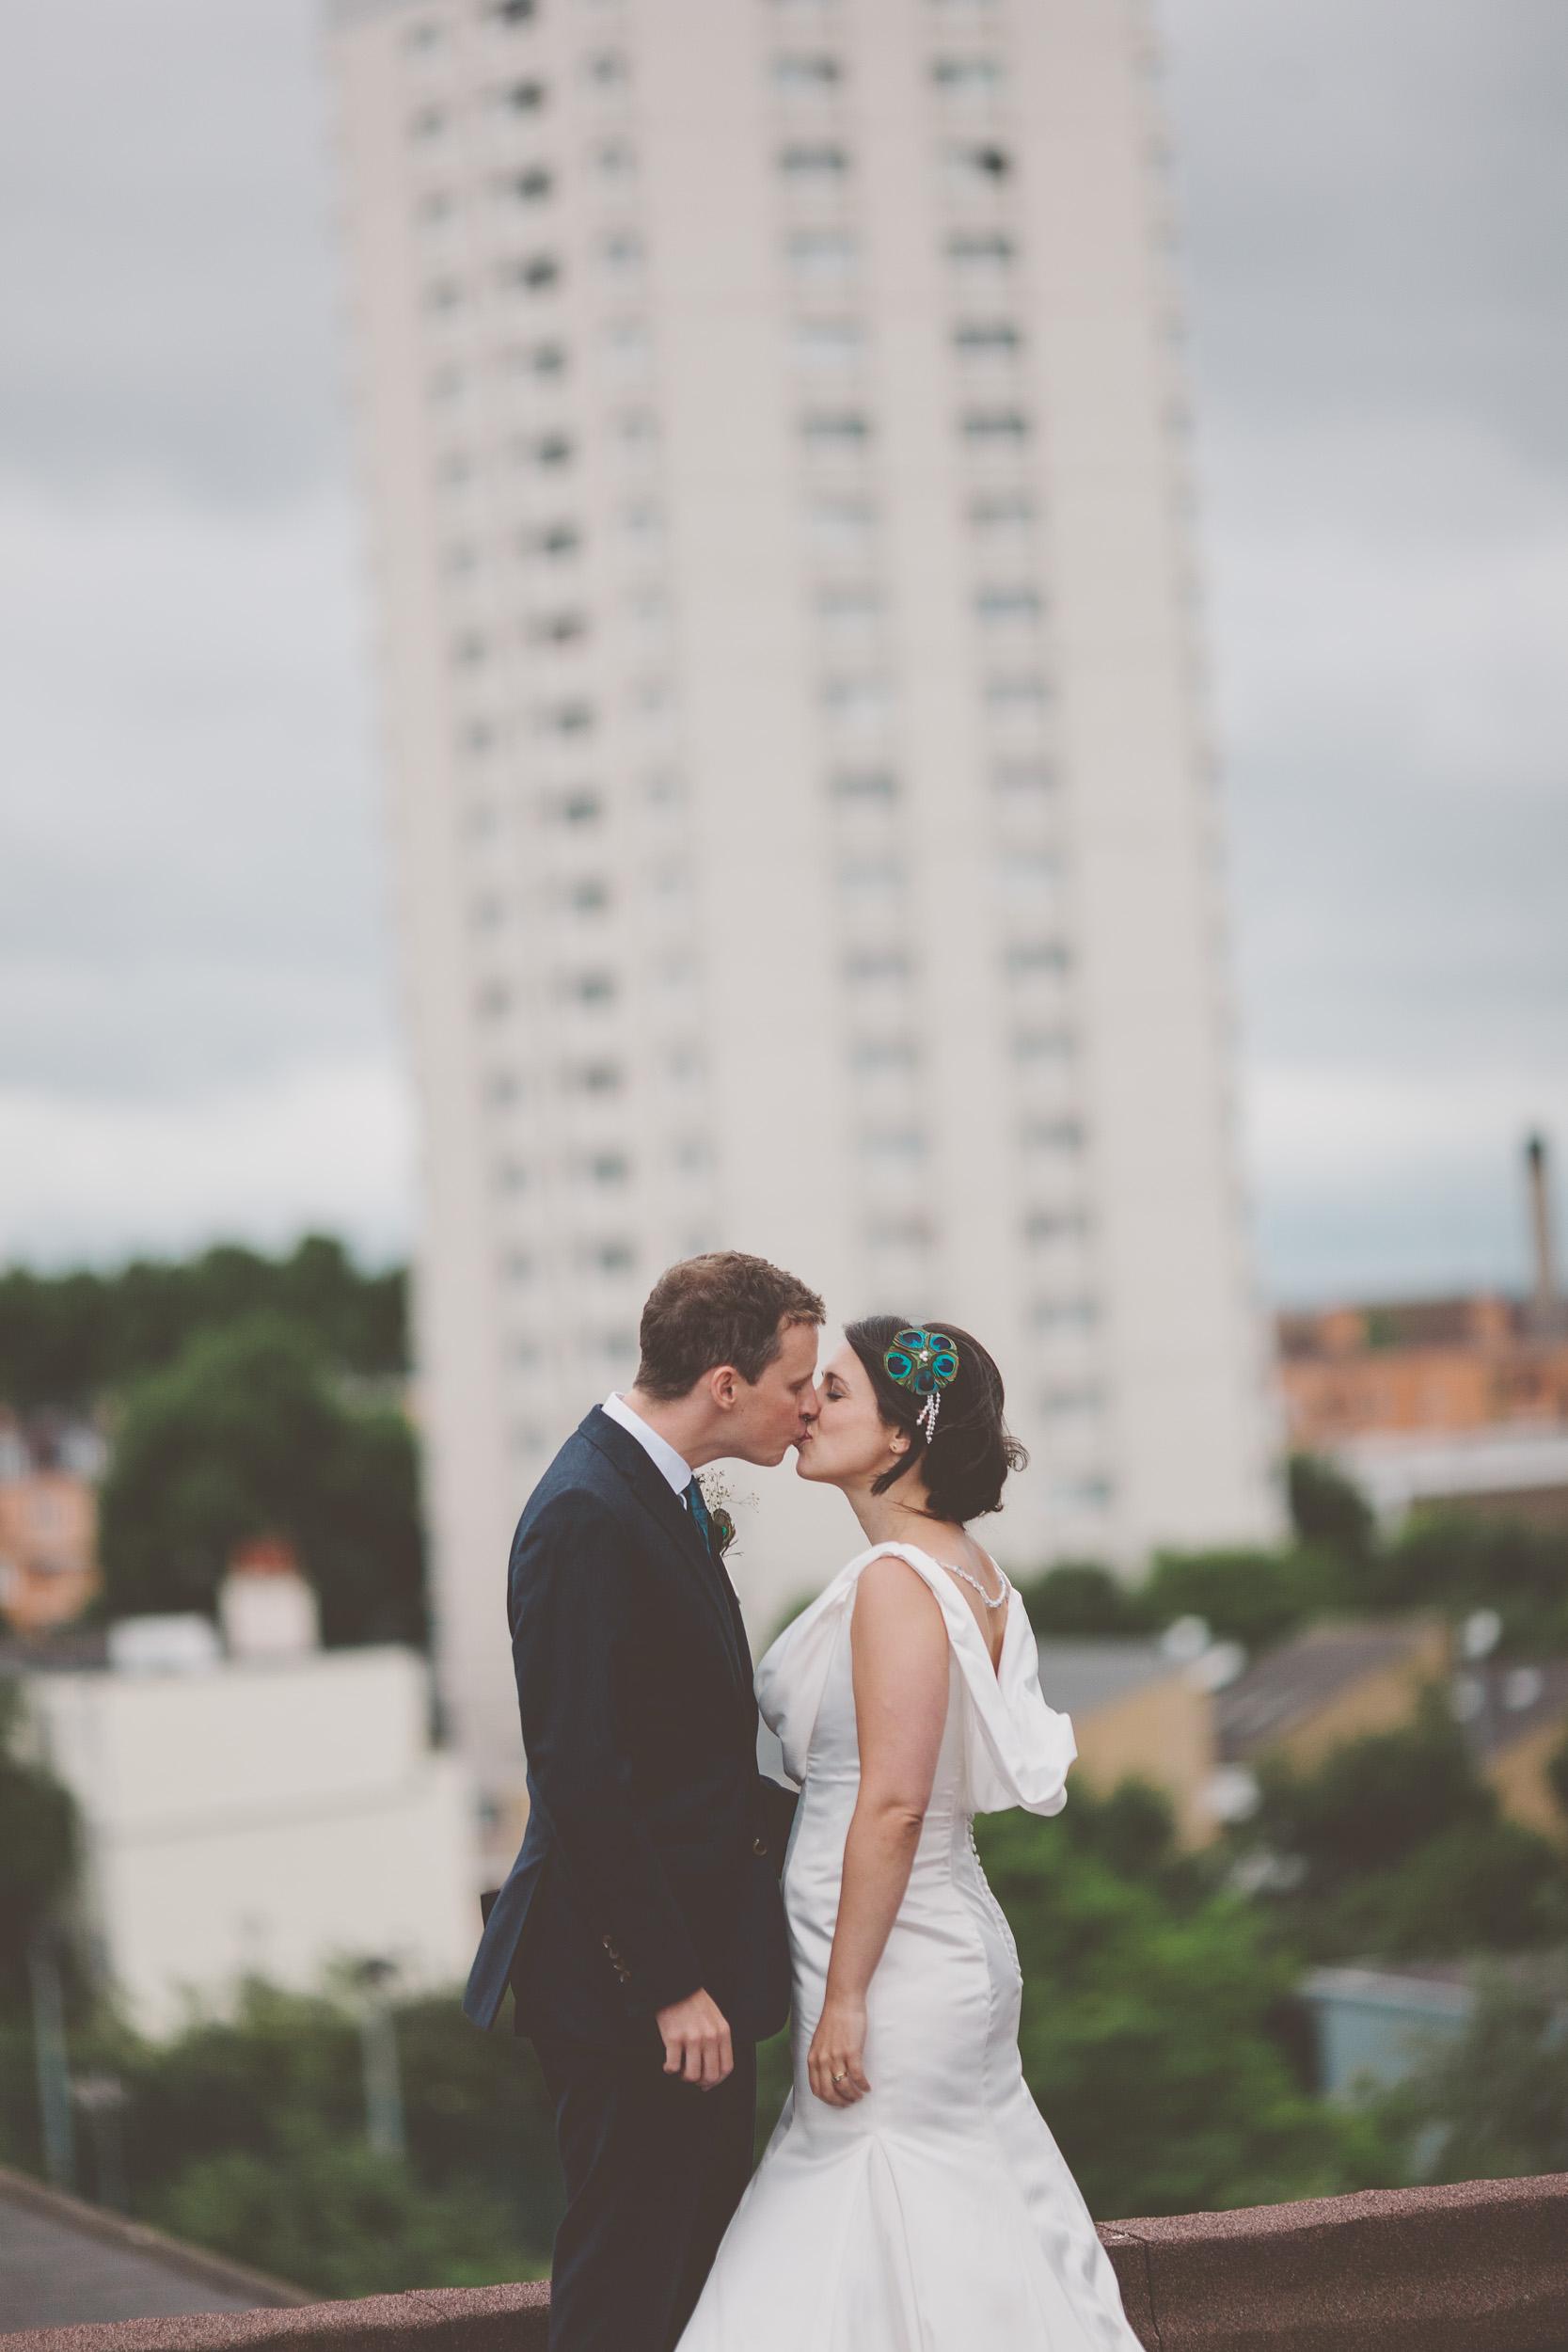 islington-town-hall-4th-floor-studios-wedding276.jpg